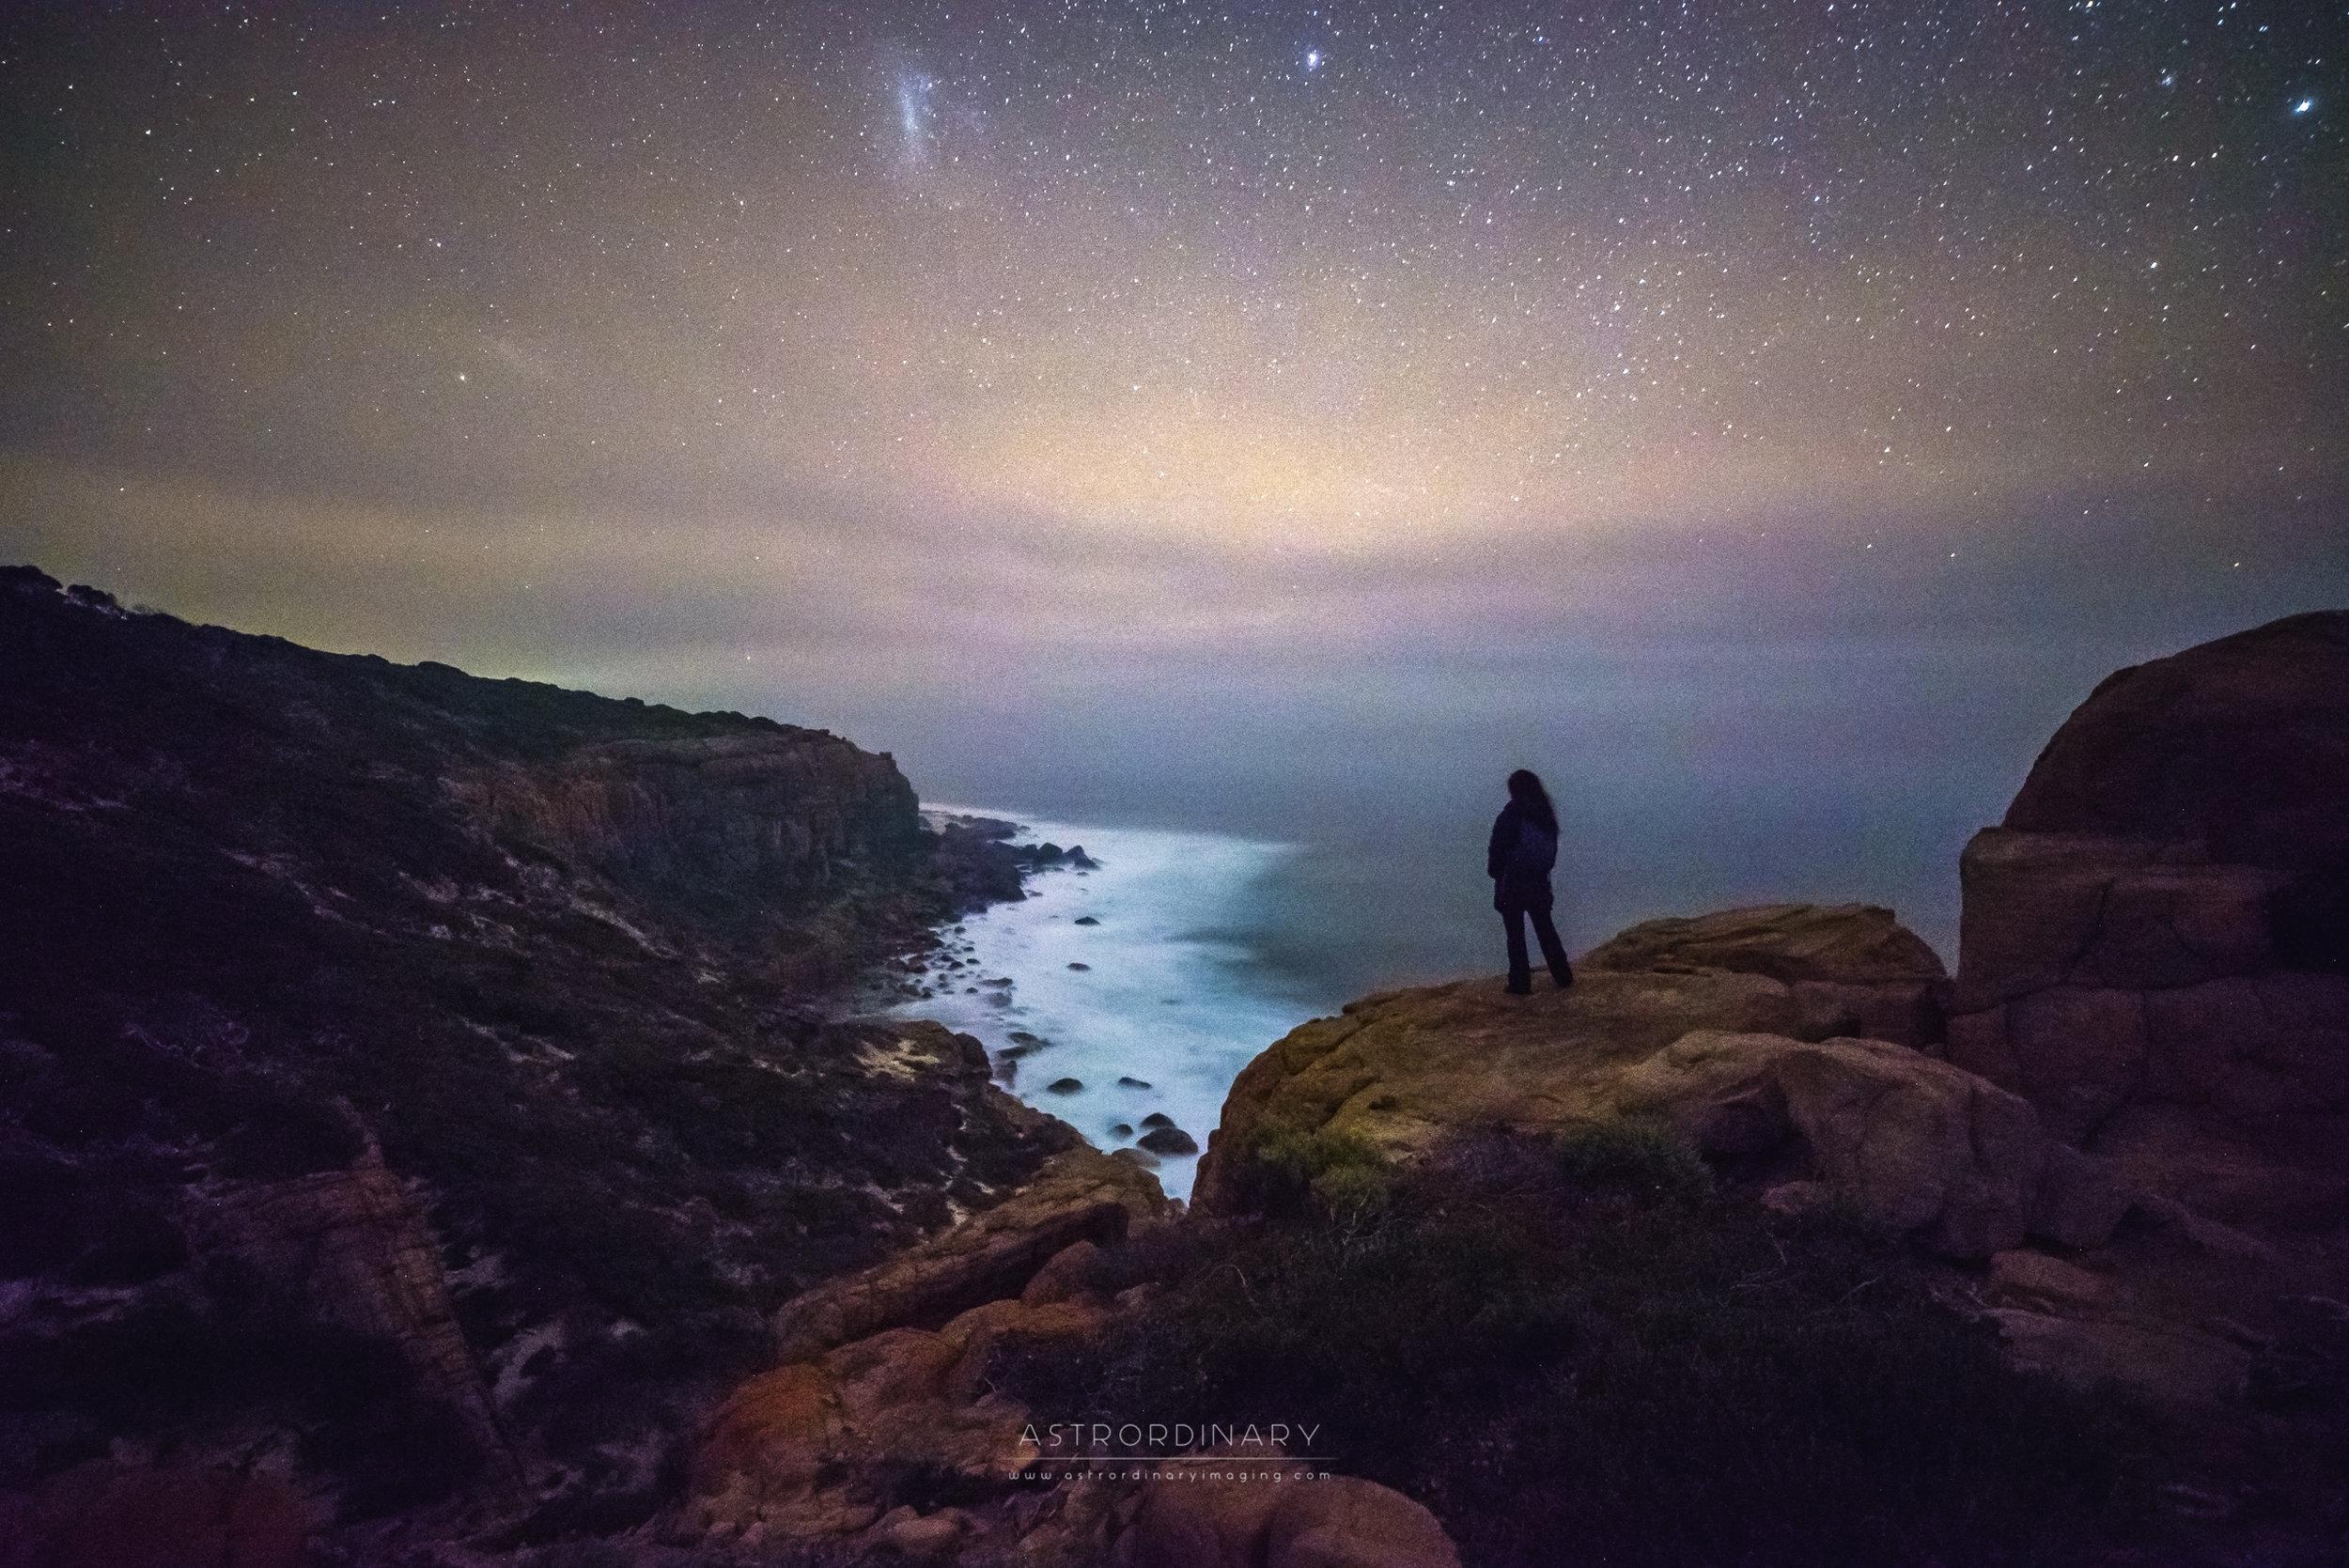 2-Night CREATIVITY & WALKING NIGHT PHOTOGRAPHY RETREAT - September 2018    $1080.00 AUD